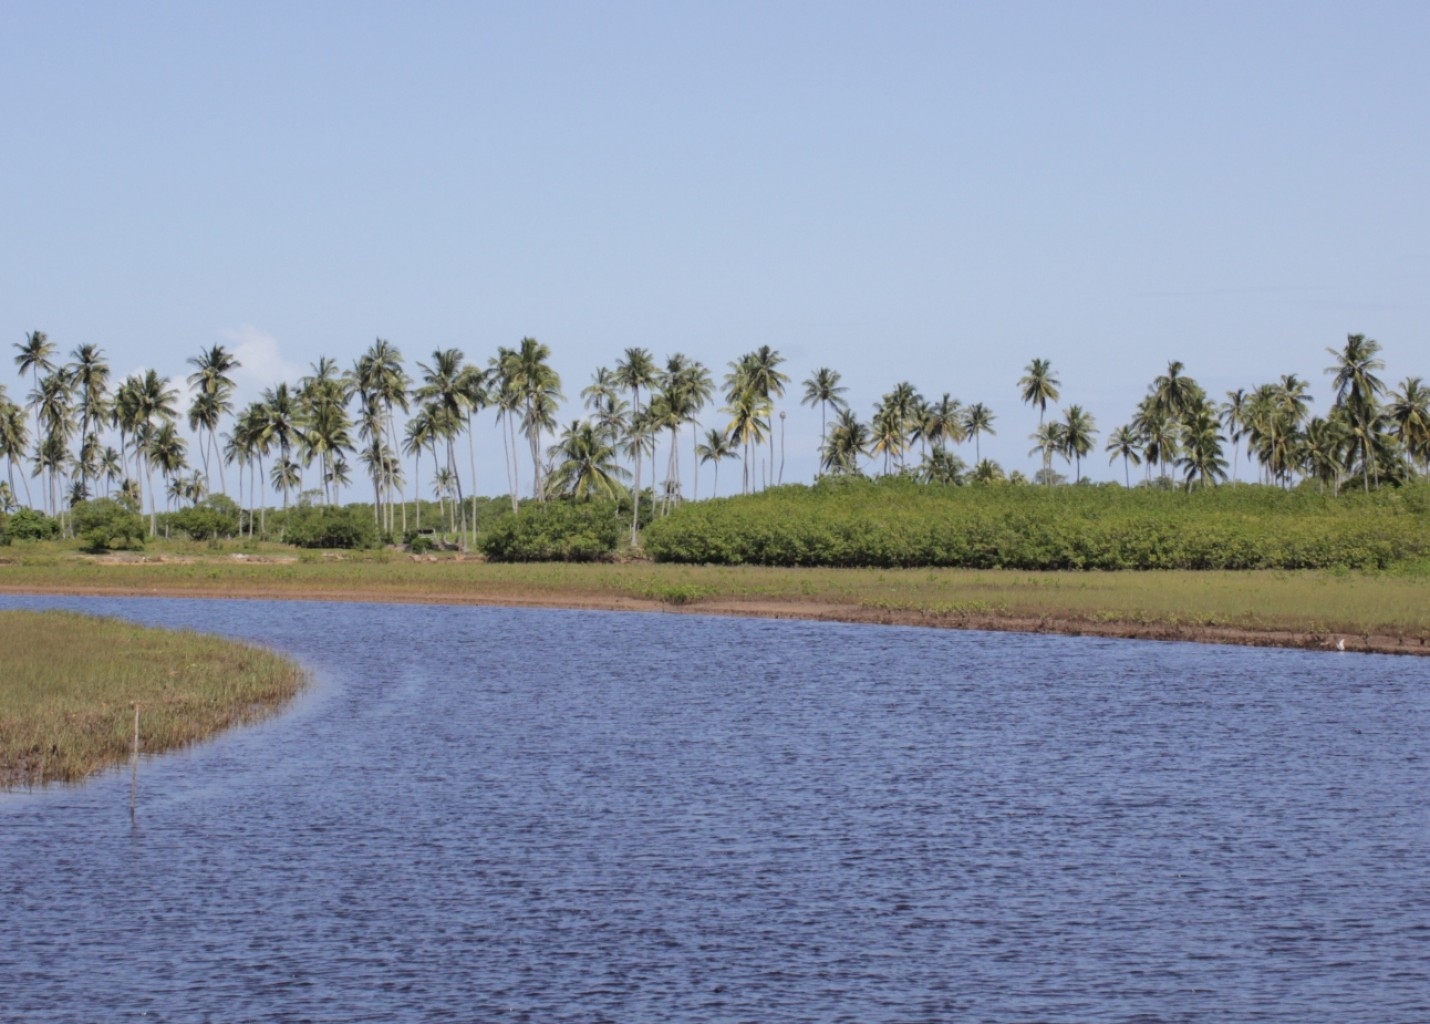 Sul da Bahia: conheça o paraíso intacto que encantou os alemães durante a Copa